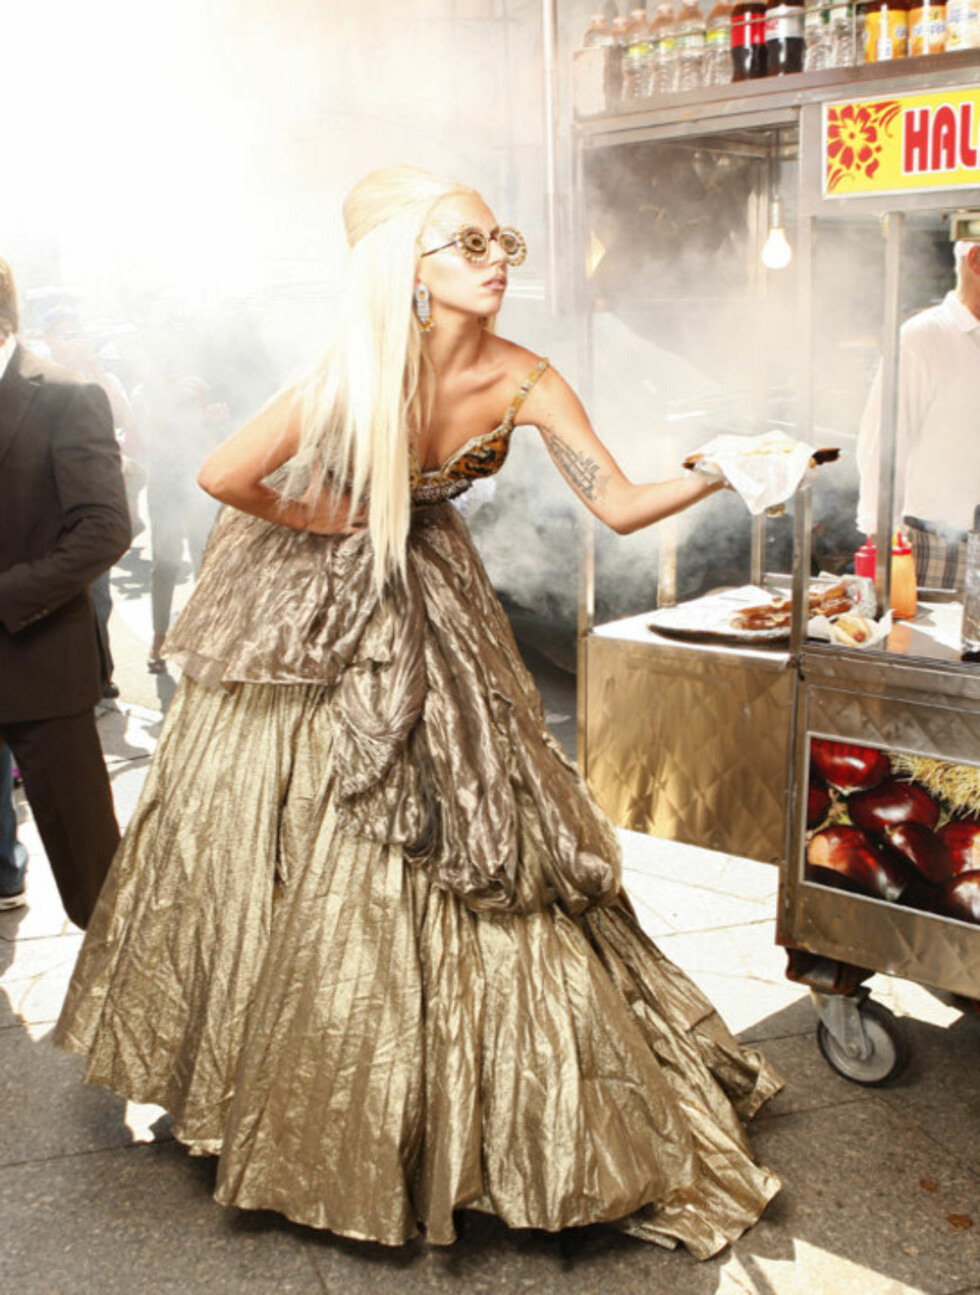 STILIG: Umulige antrekk kombinert med unaturlige positurer? Motereportasje i Vanity Fair, så klart! Lady Gaga «spiser» pølse i brød under fotograferingen. Foto: All Over Press